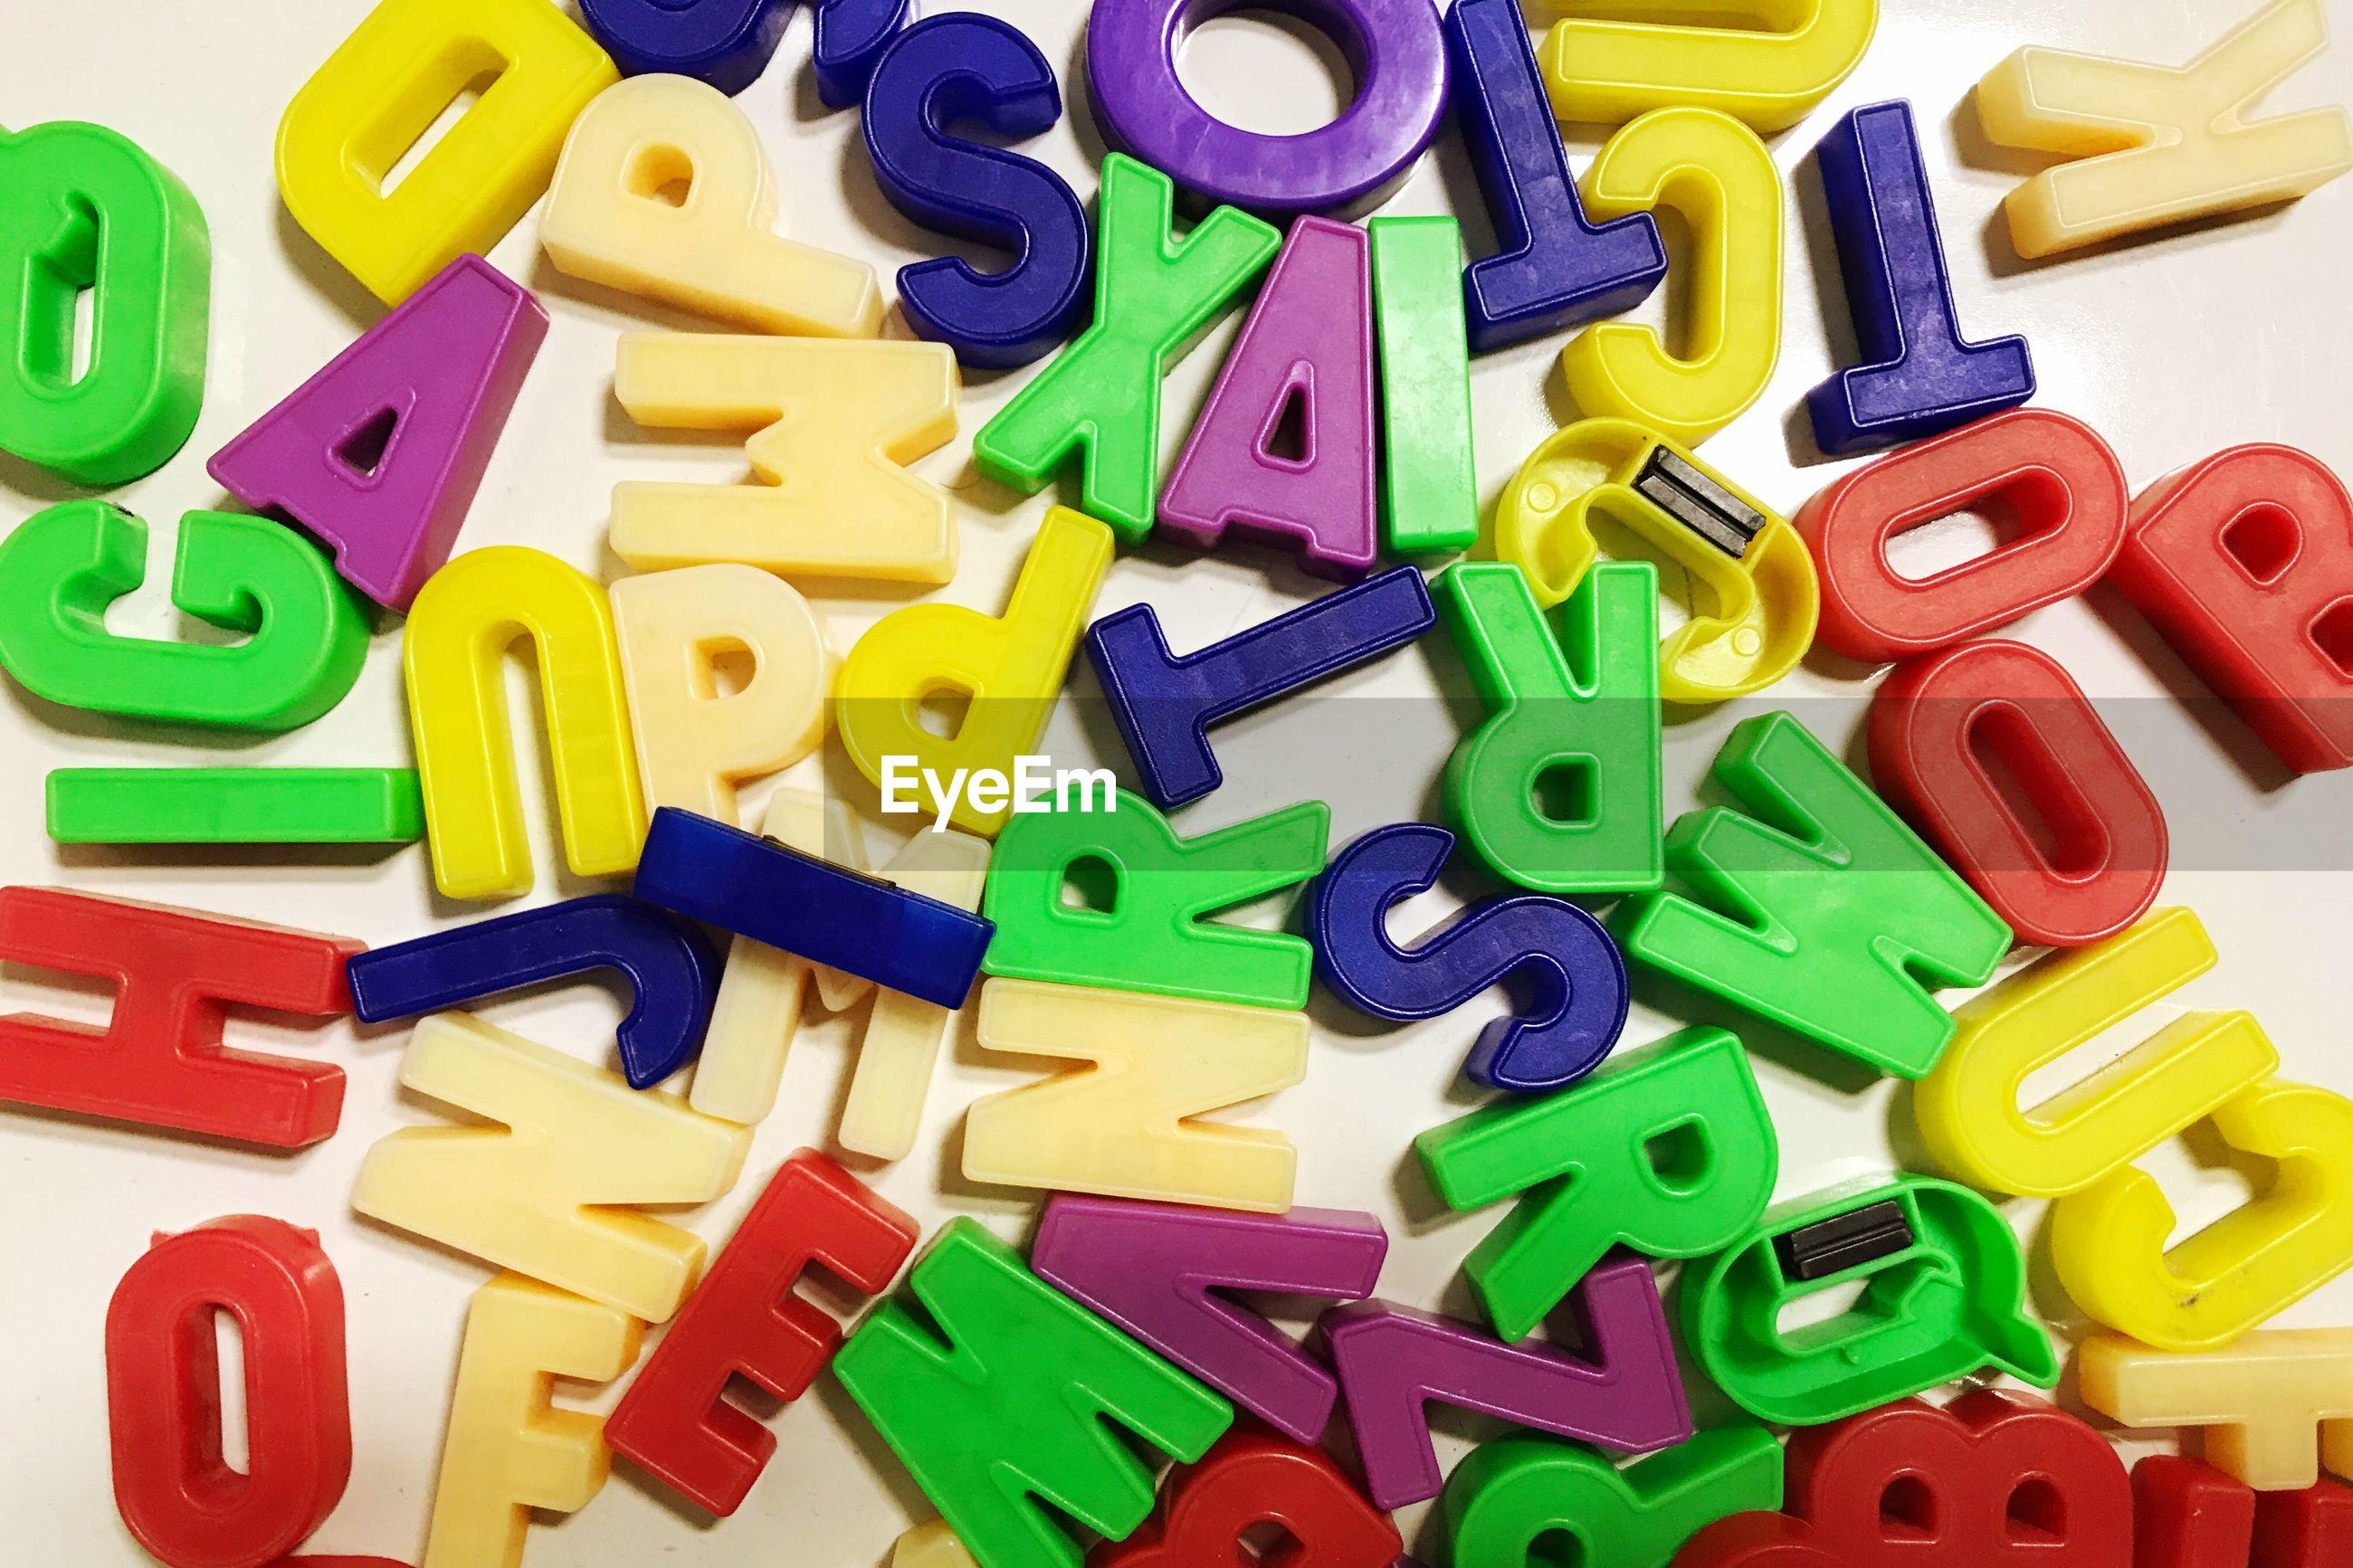 Full frame shot of colorful alphabet toys on table